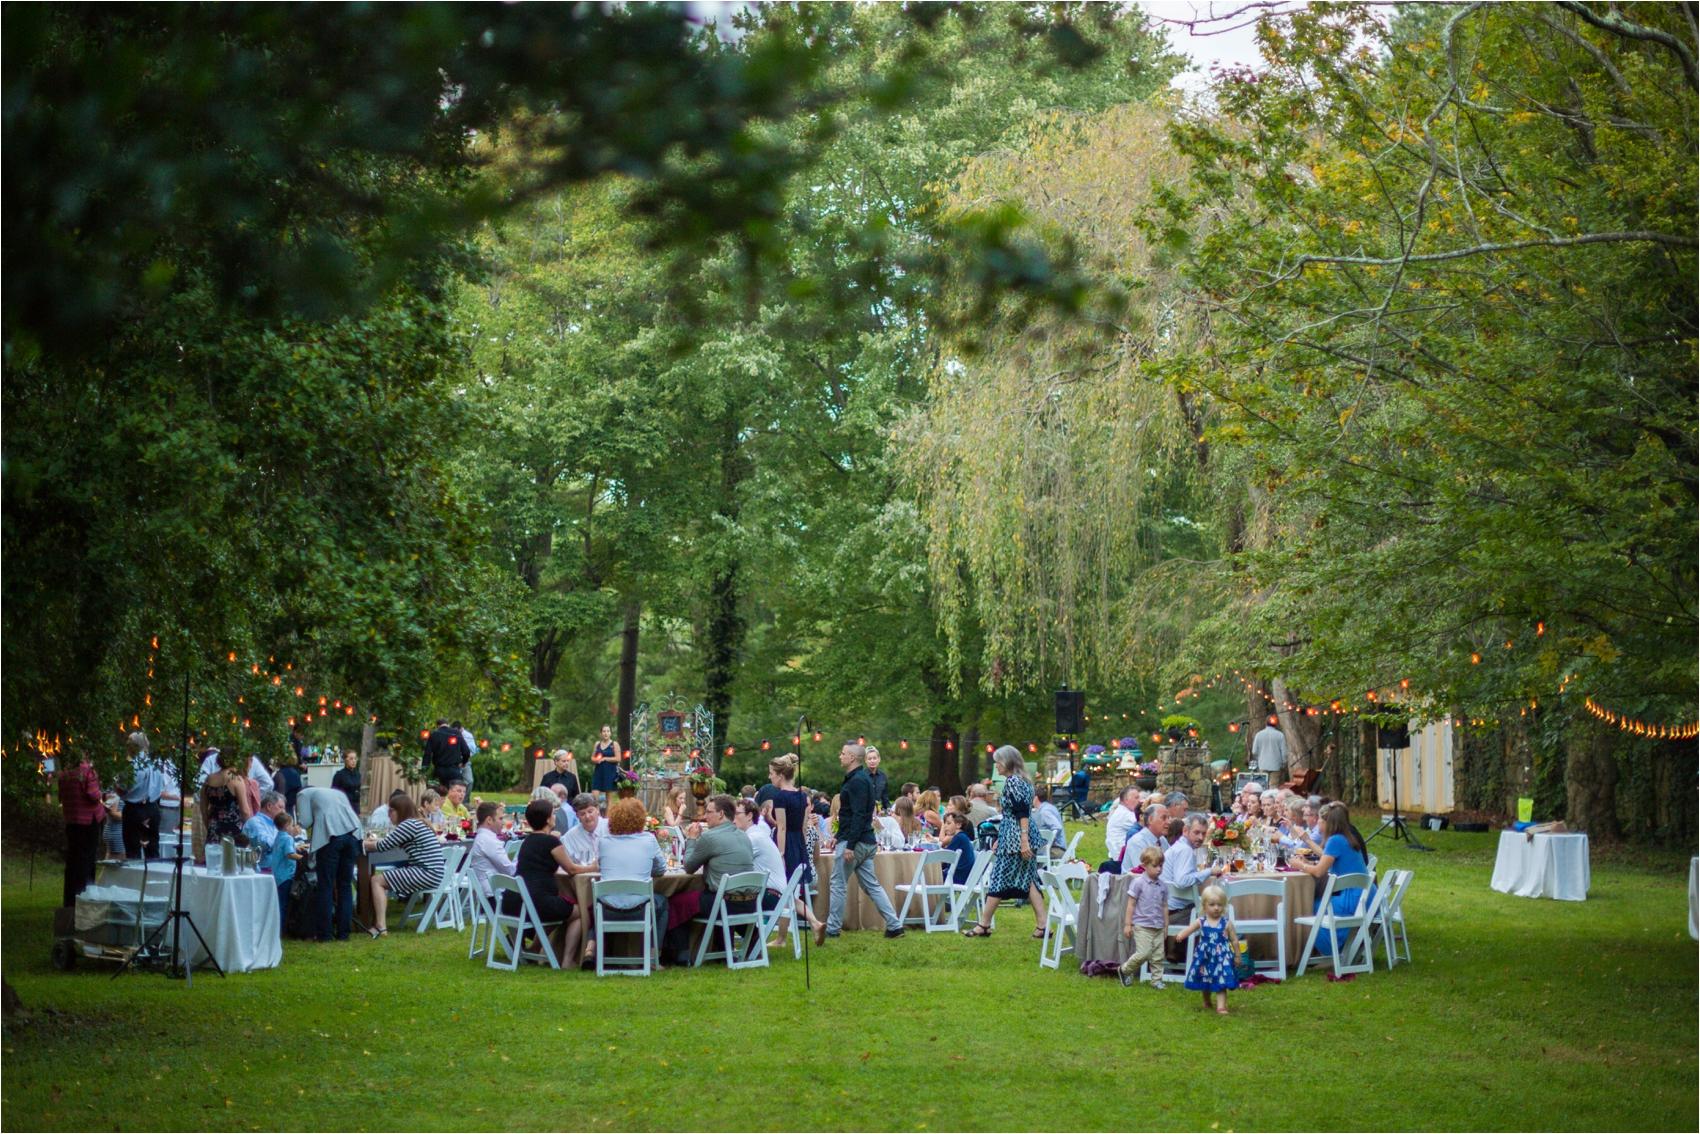 Feather-and-Oak-Rainforest-Trust-Virginia-Wedding-0013.jpg